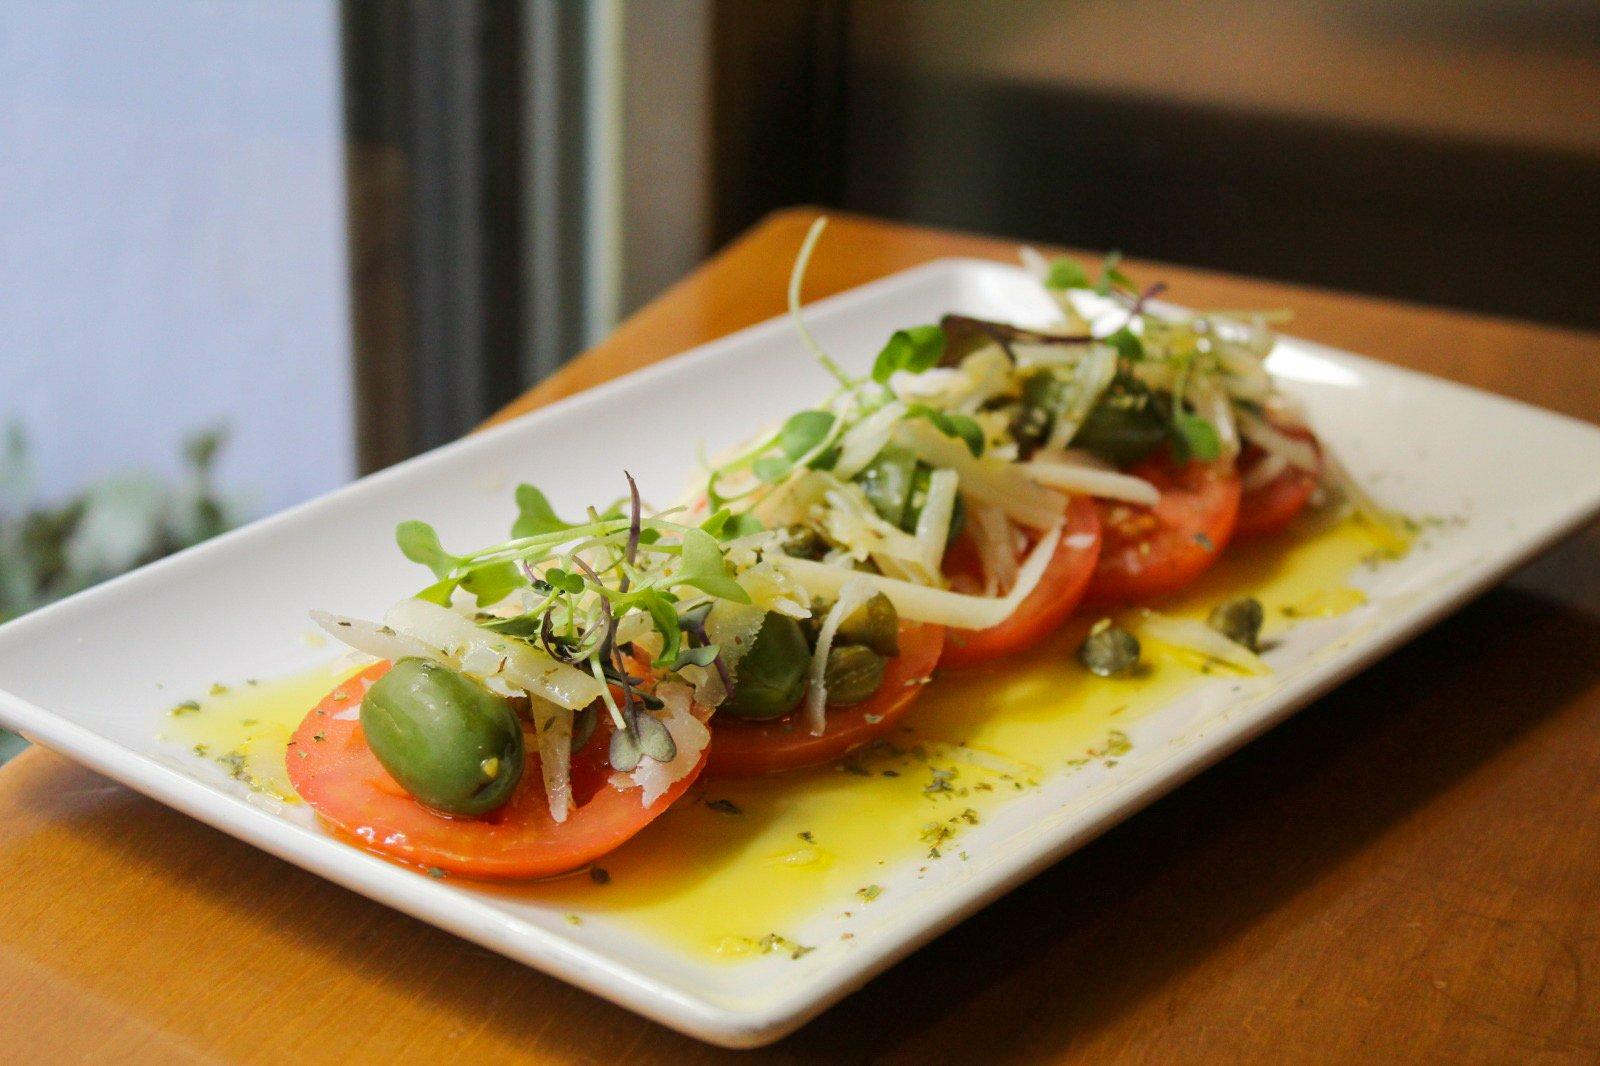 Ensalada manchega con tomate, queso manchego, aceitunas, orégano y alcaparras